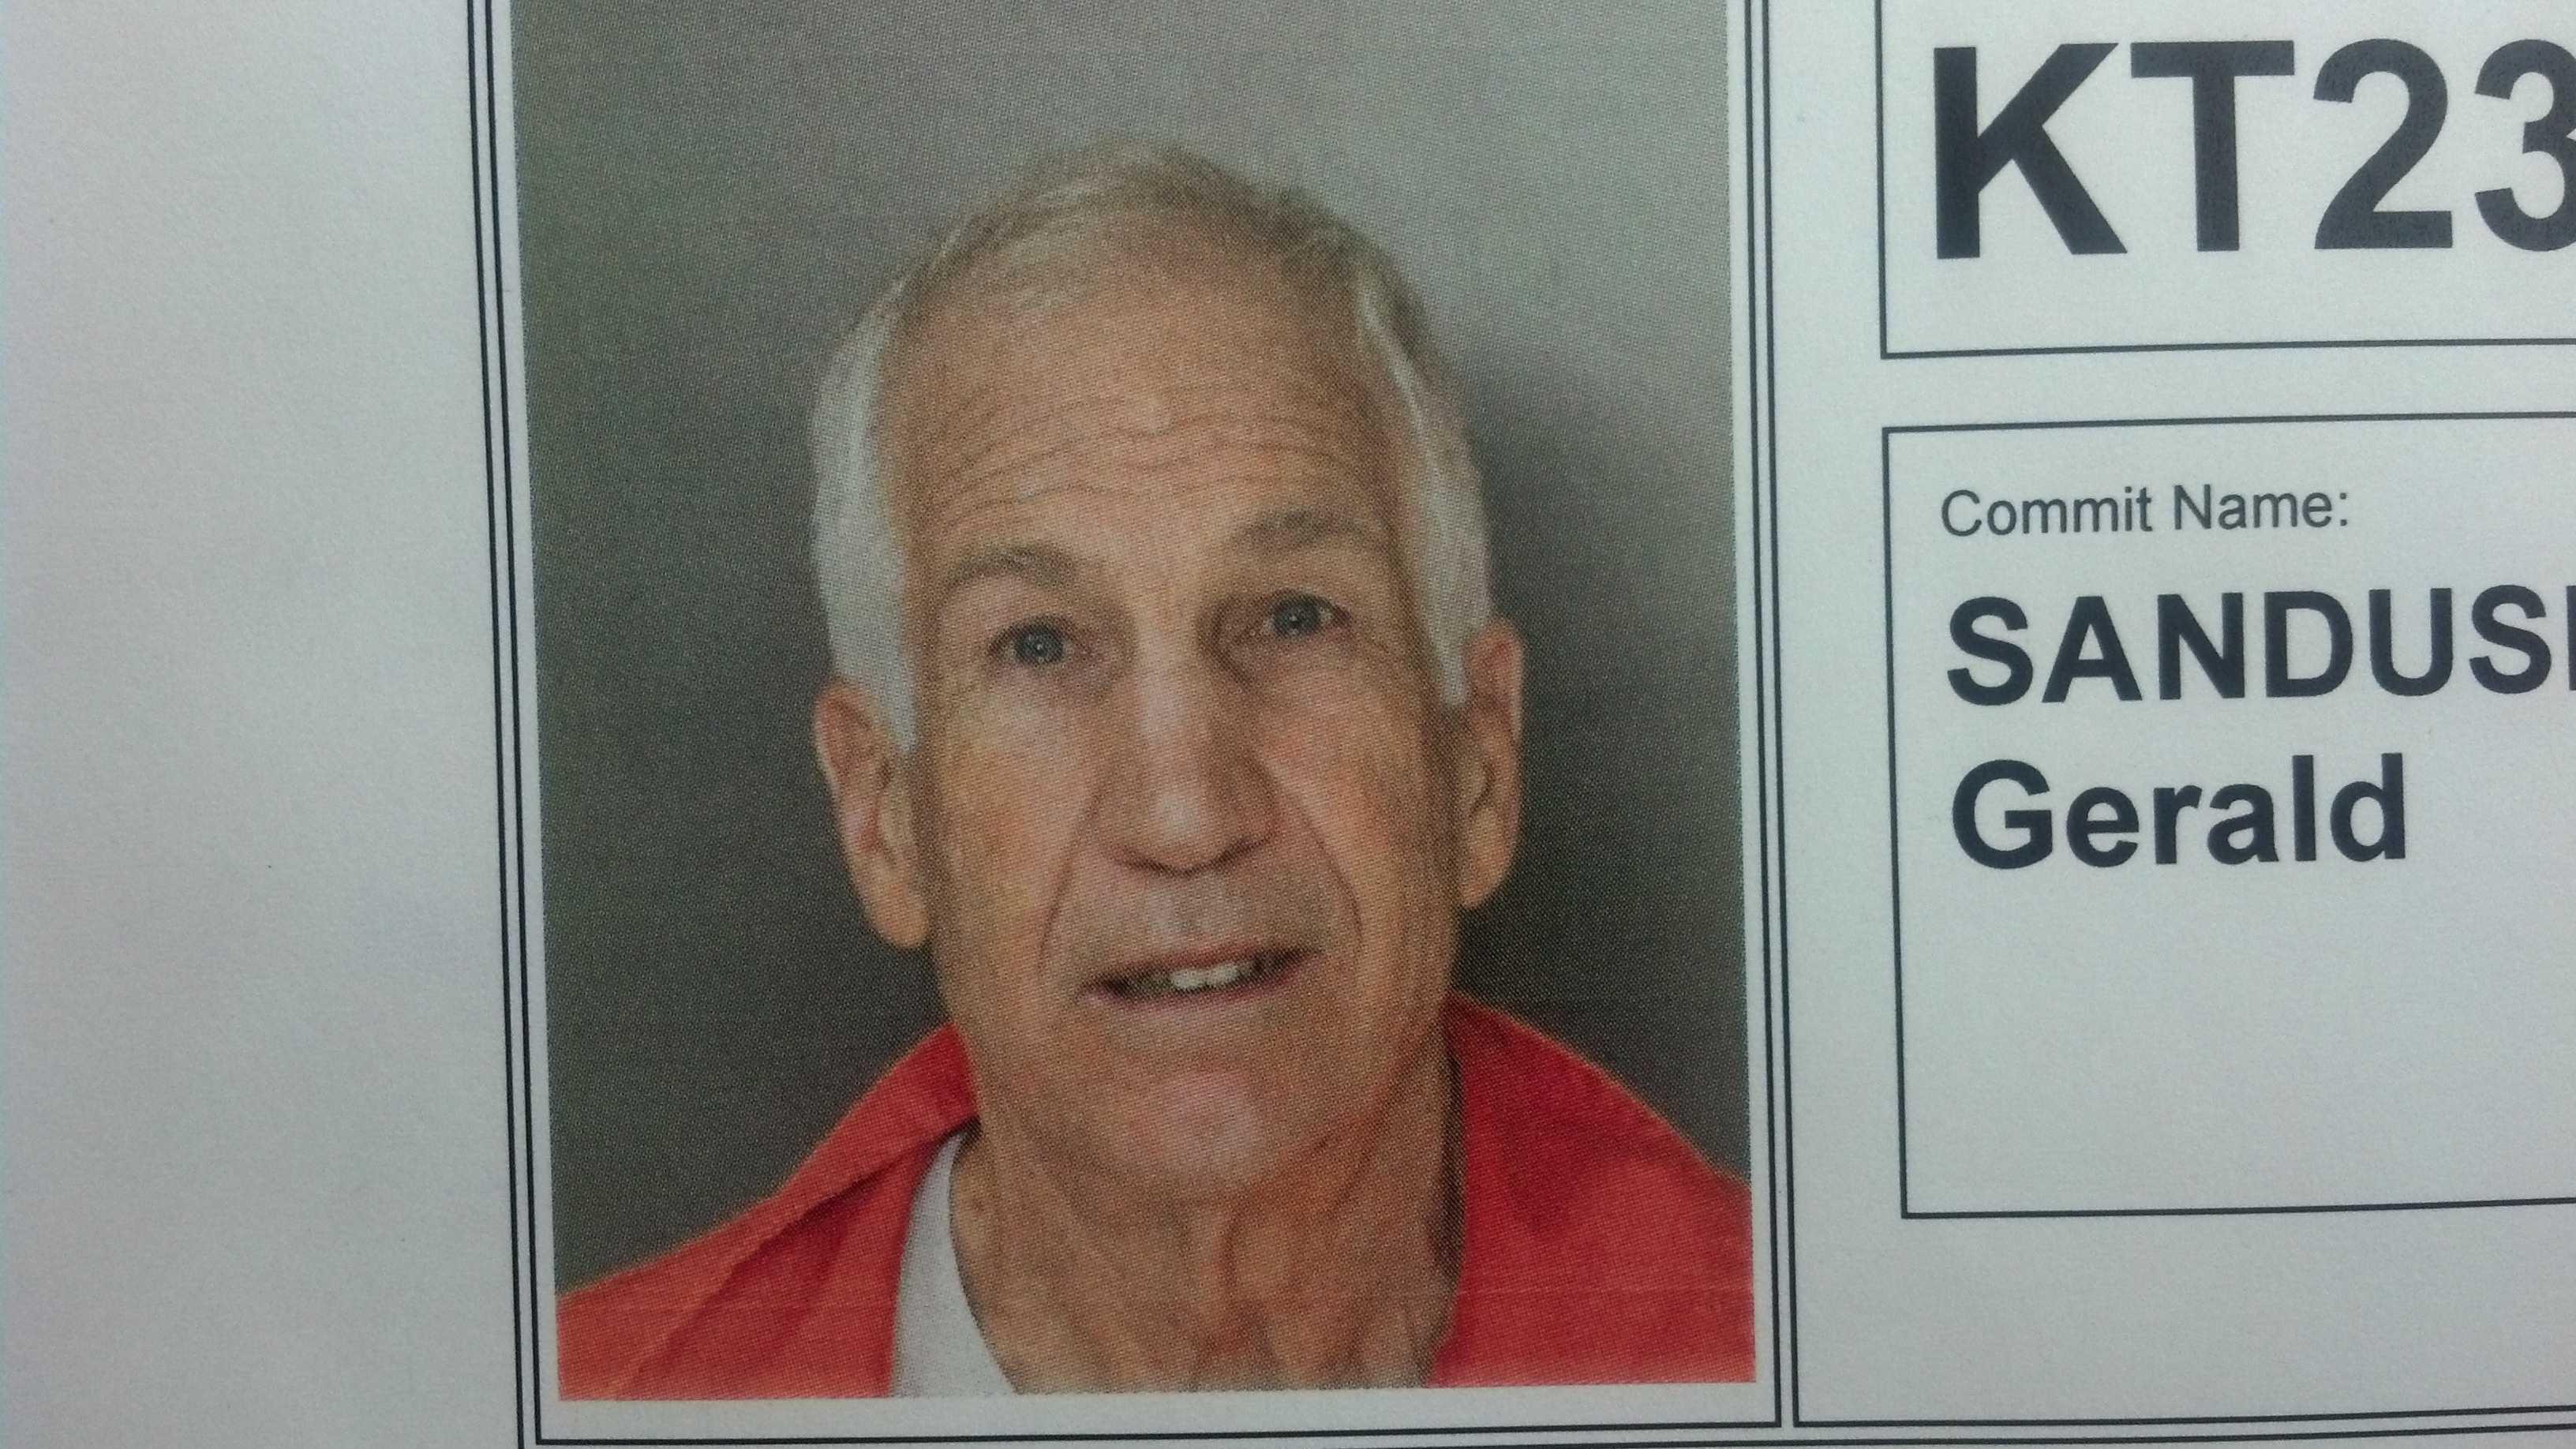 Jerry Sandusky's prison mug shot.